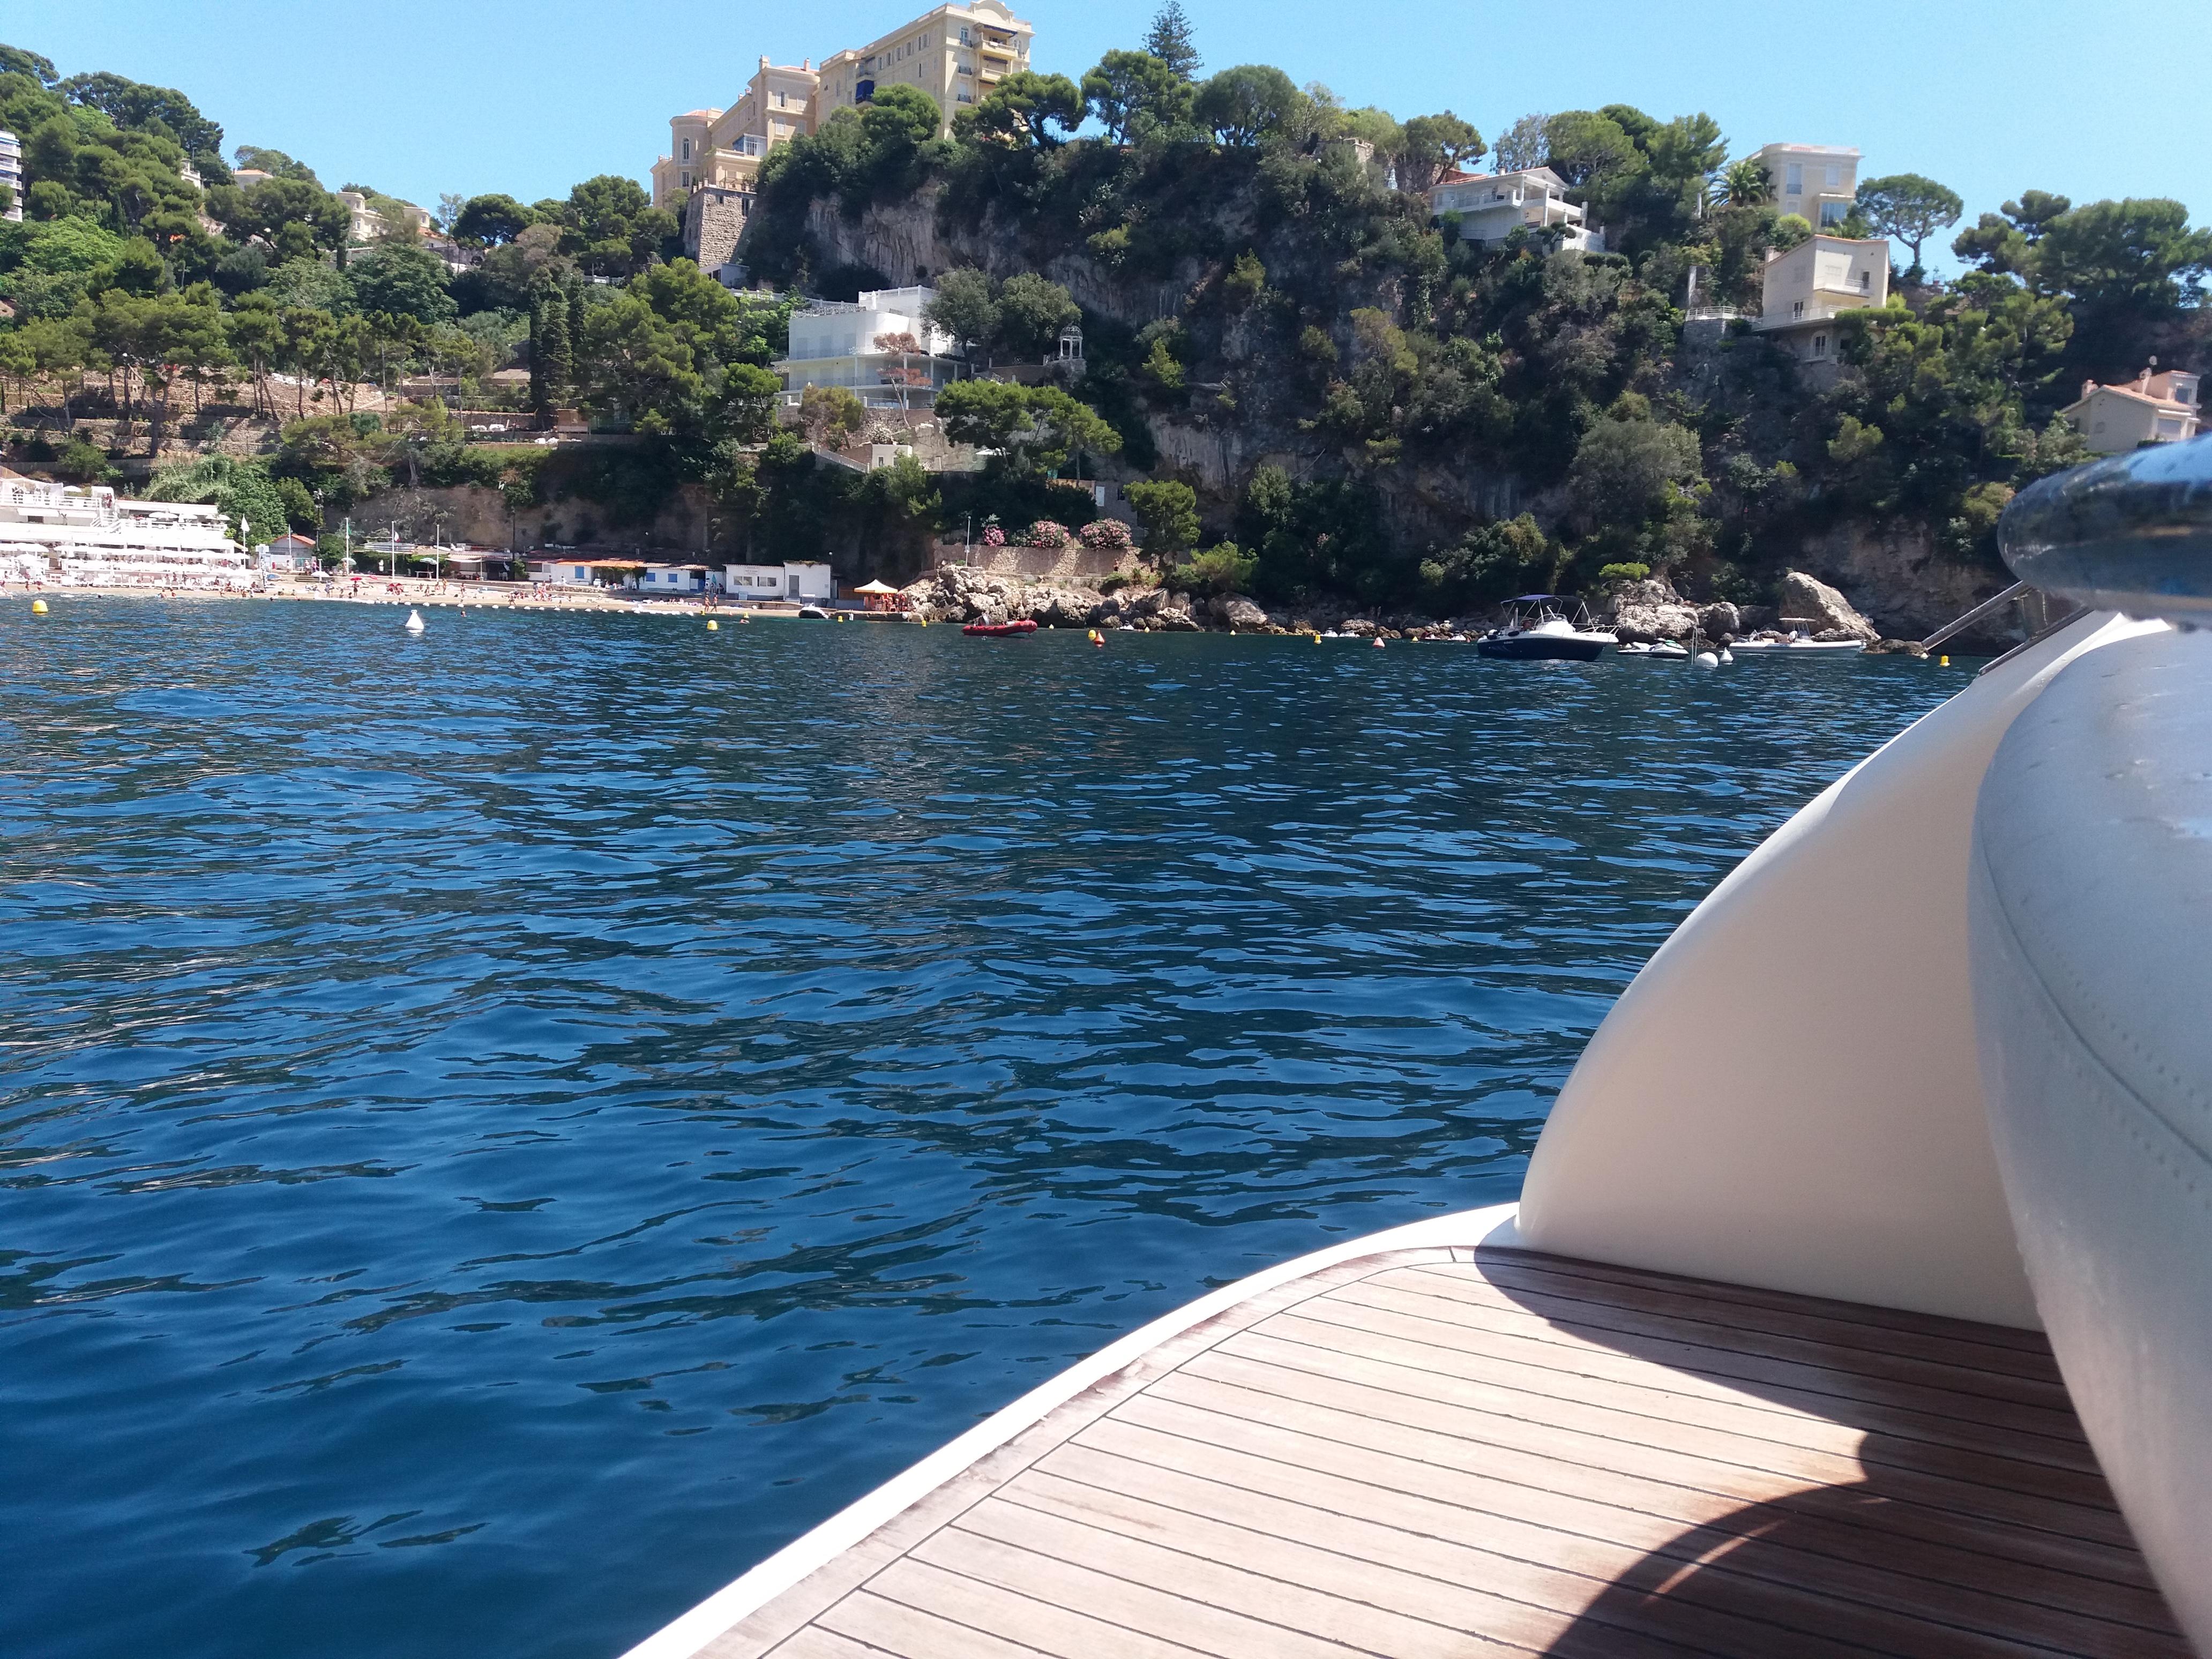 Riviera_Yacht_Charter_Costa_Azzurra_Cap_D'Ail_1